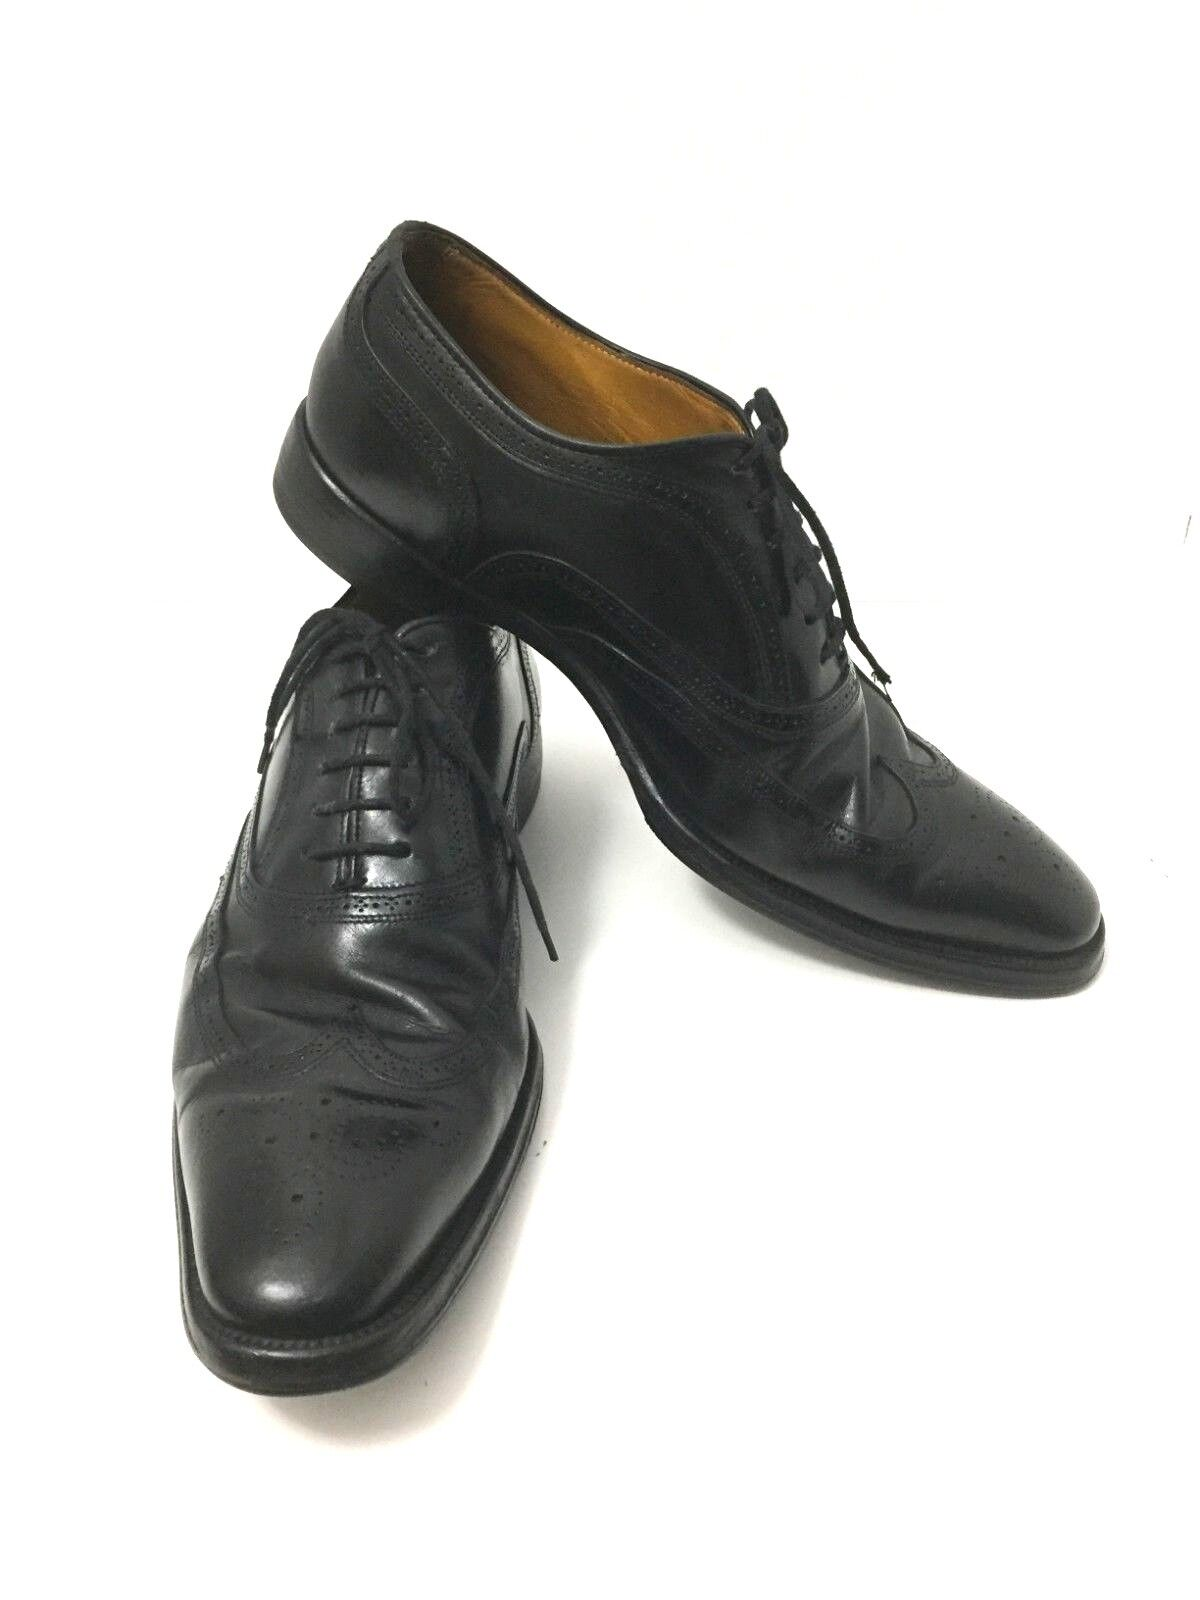 più preferenziale Canali Canali Canali Uomo Wing Tip nero Dress scarpe. Dimensione  EUR 42   US 8.5 Made in .  clienti prima reputazione prima